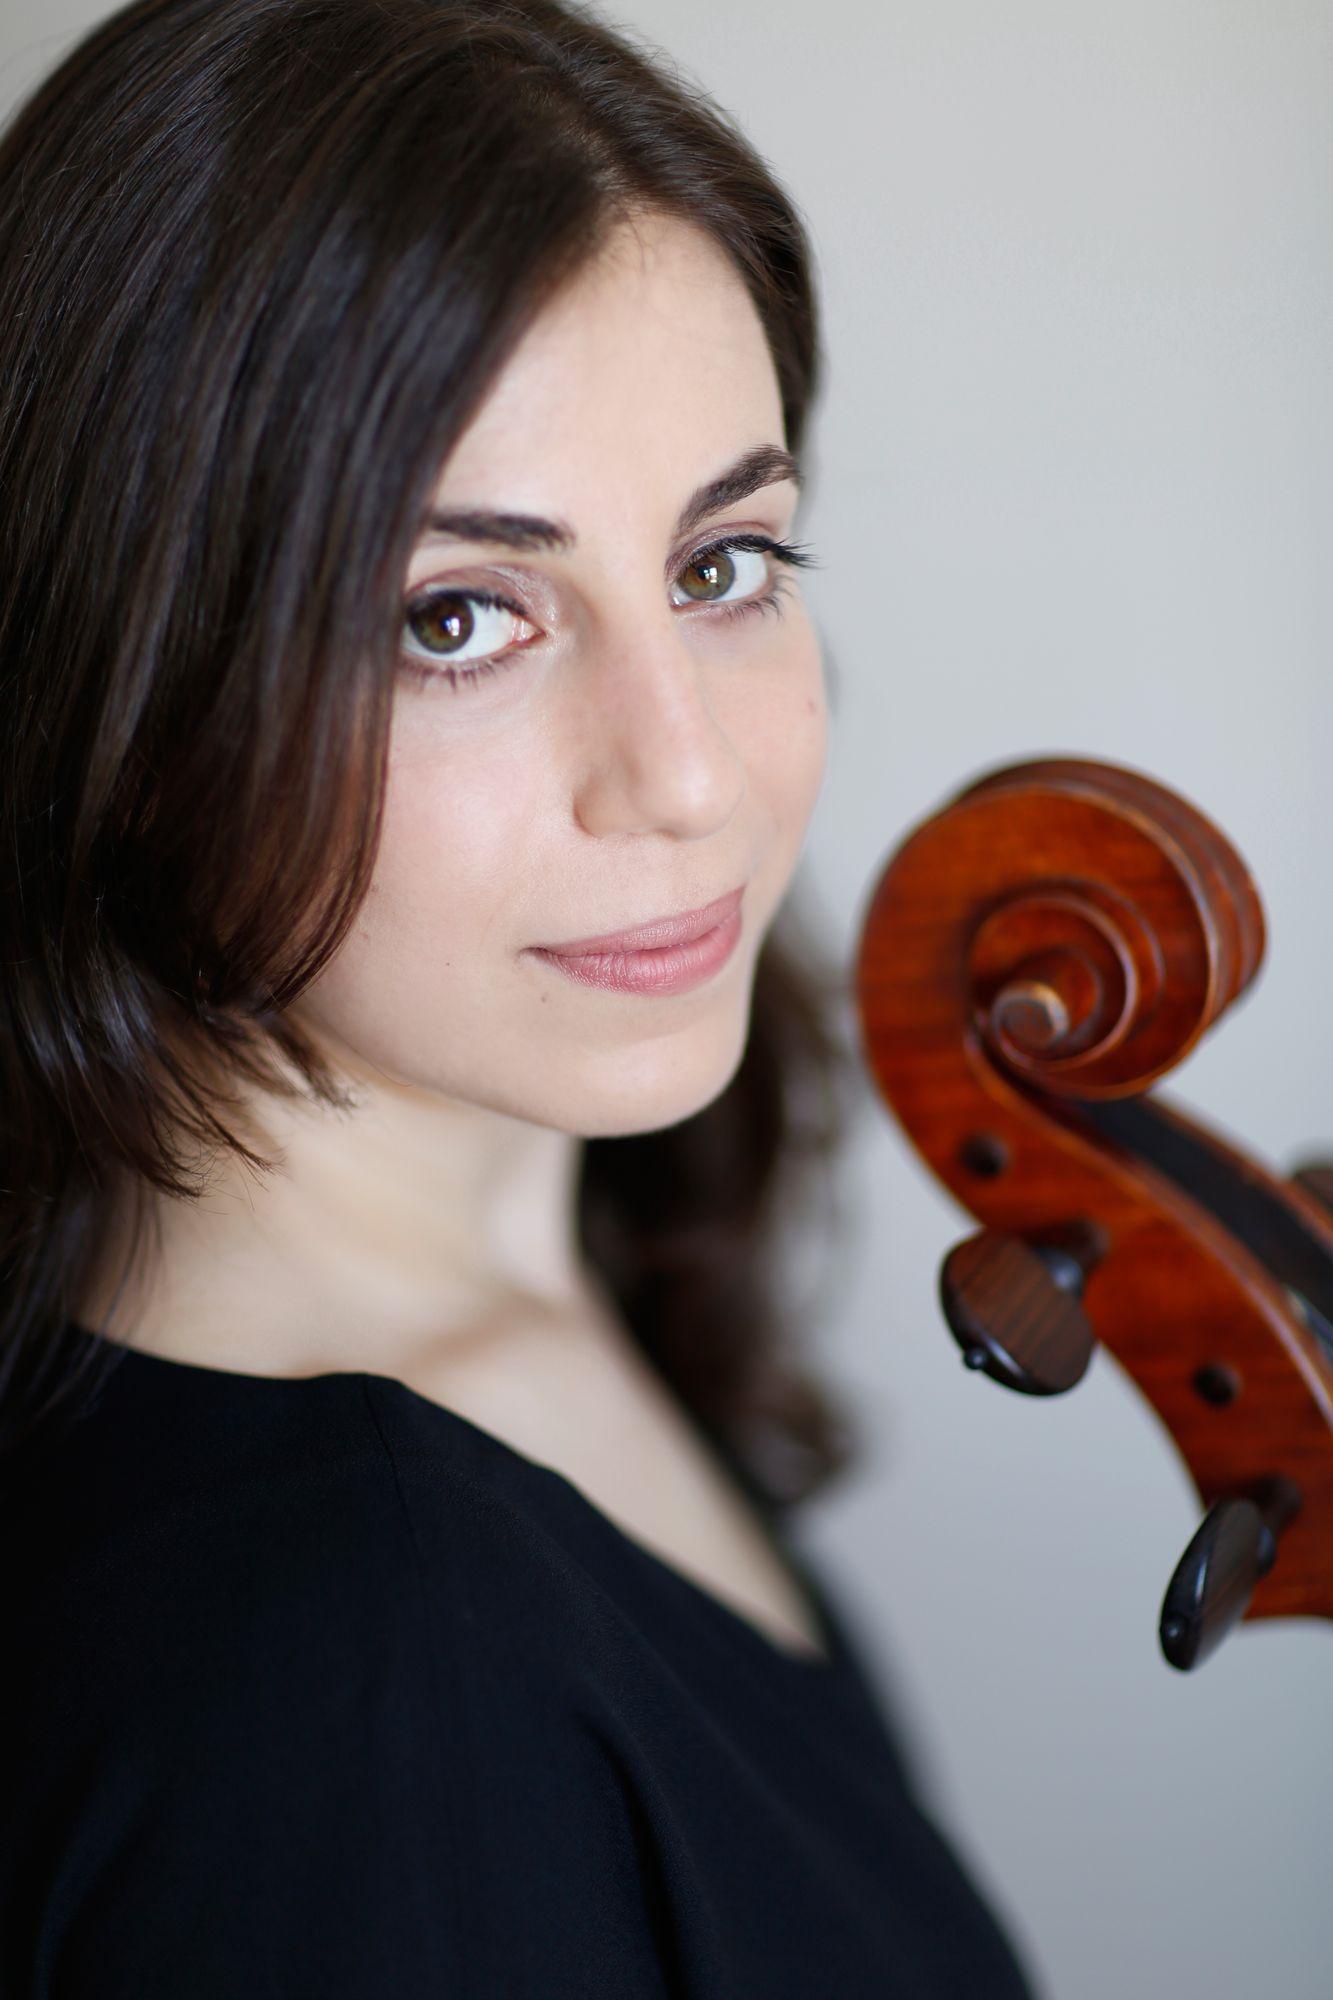 Erin Stegeman